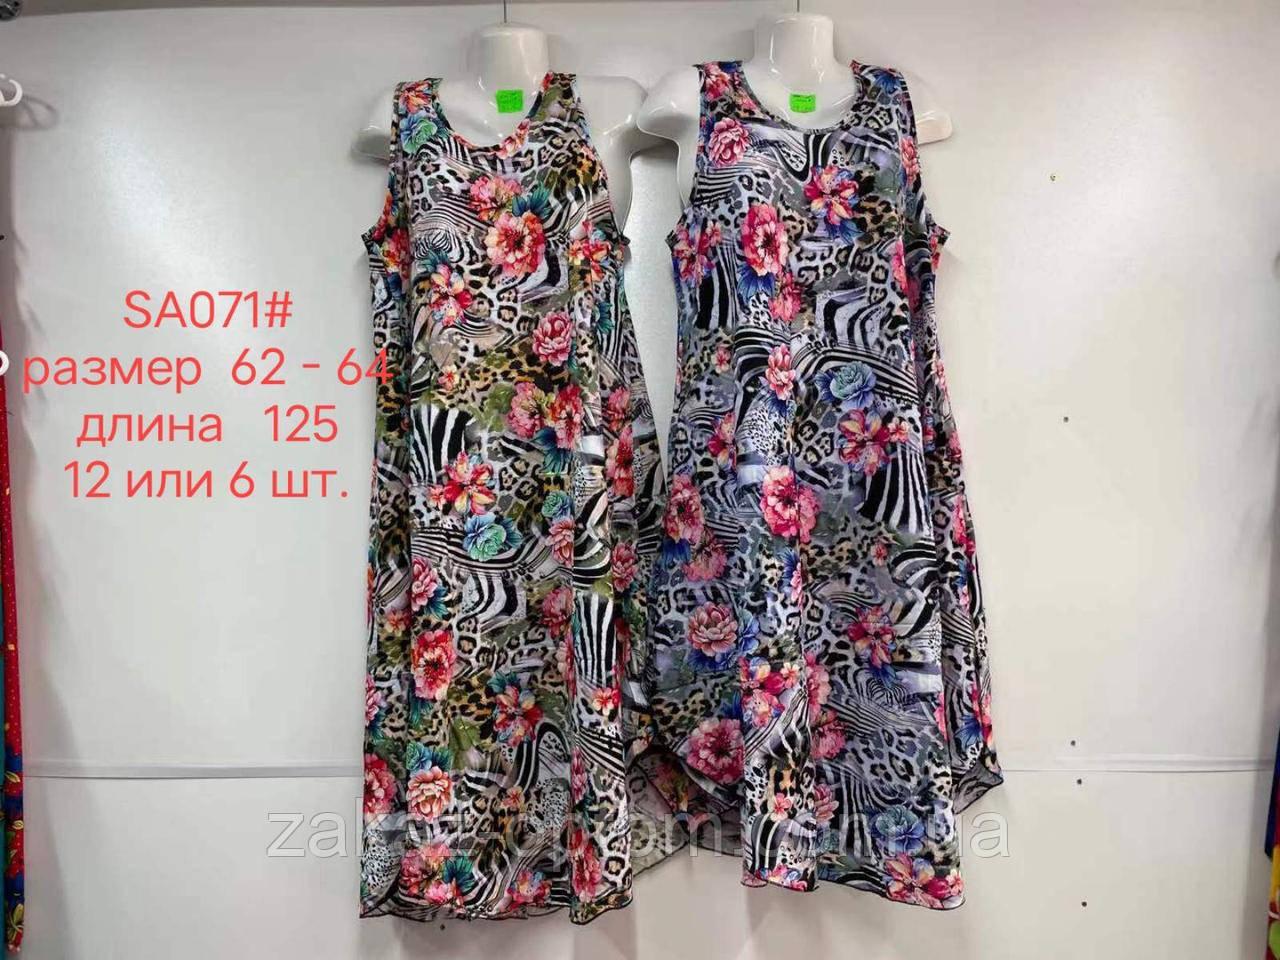 Халат жіночий оптом 125 см довжина (62-64) Китай SA071-73692